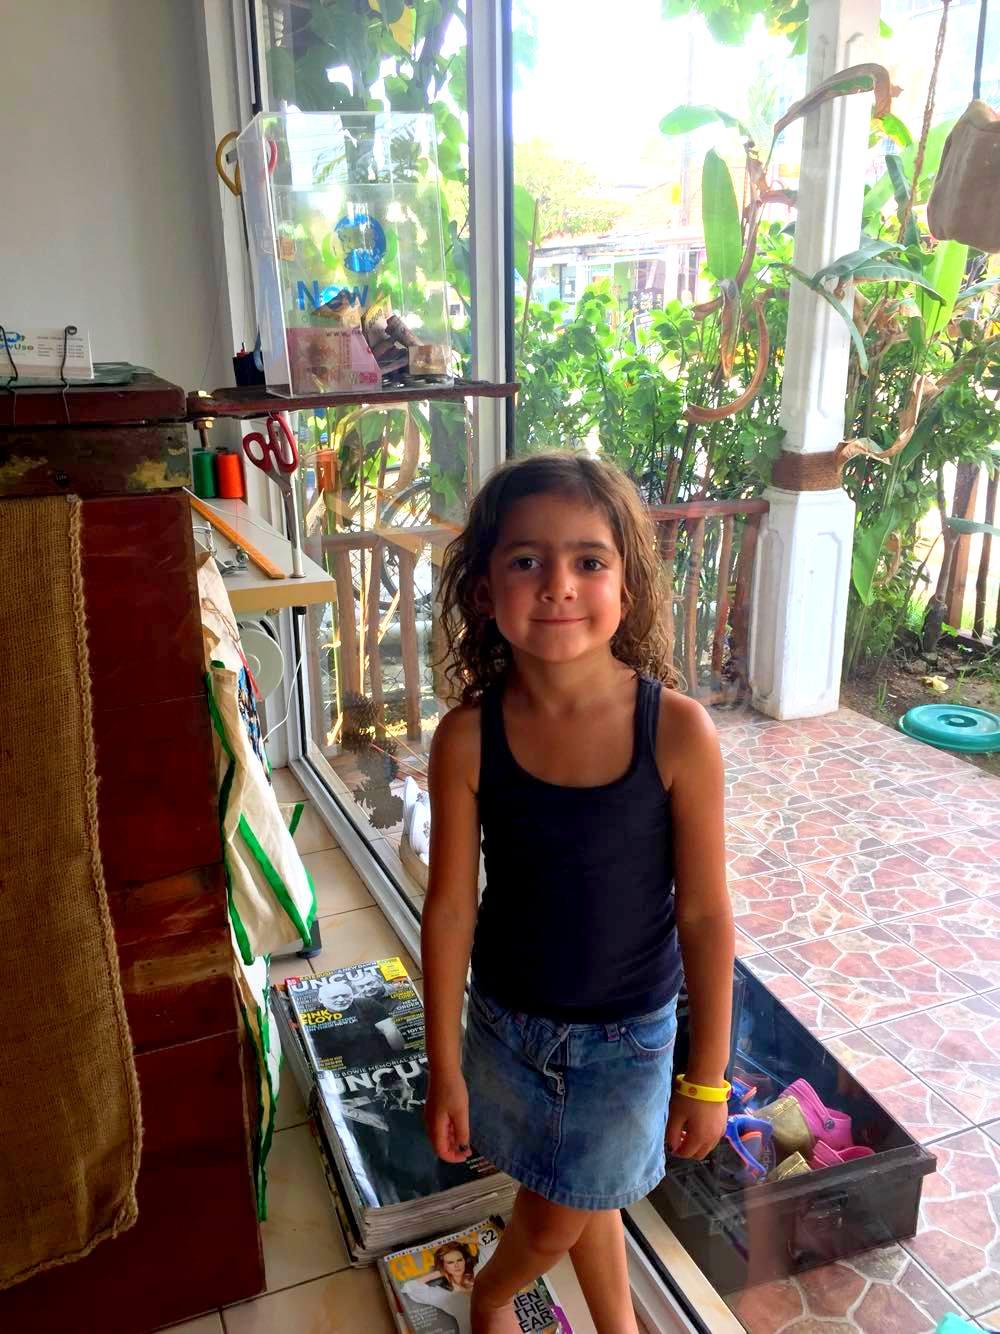 Salma_gives_cash_donation_to_NewUse